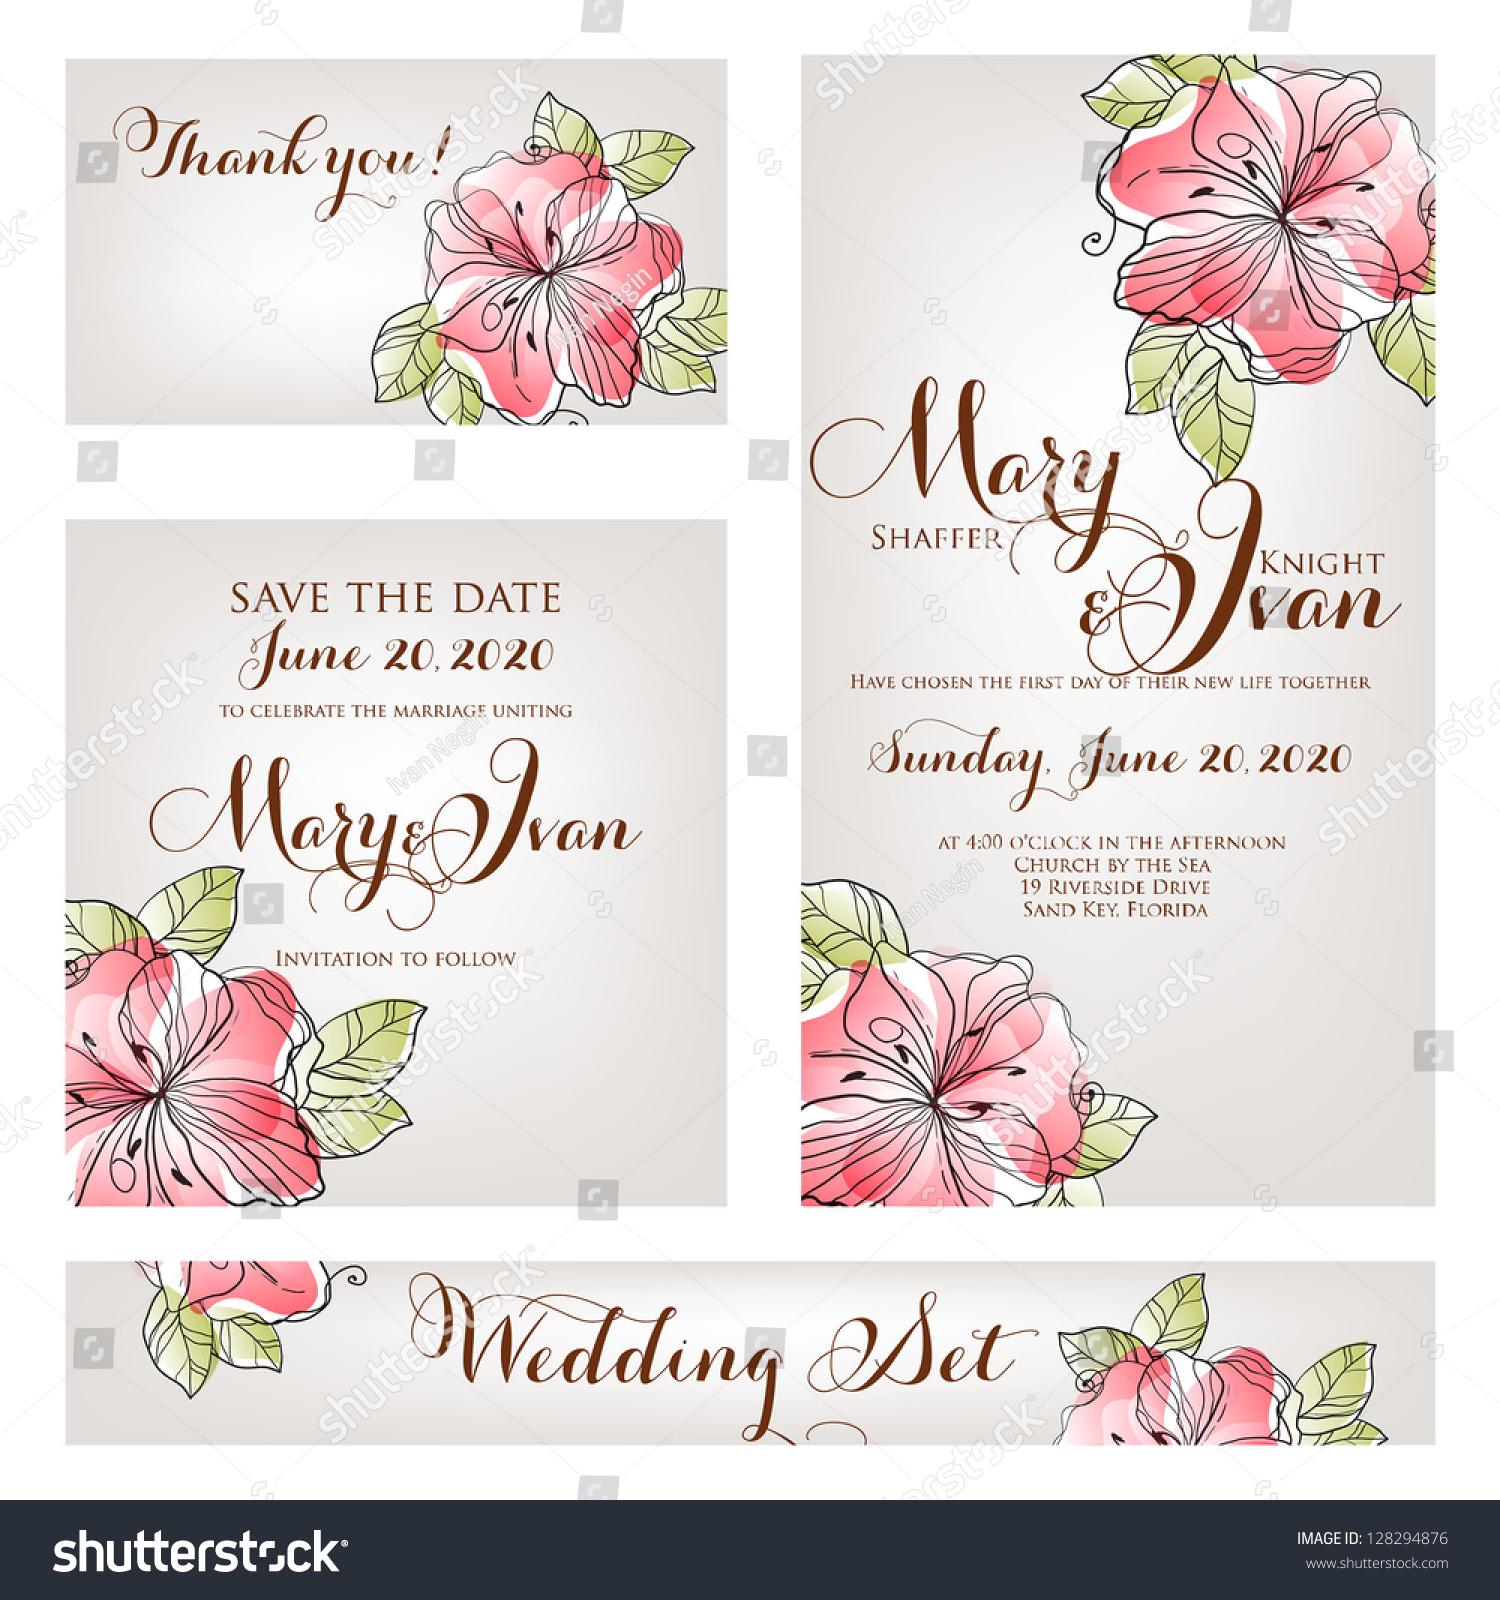 wedding invitation wording thank you cards thank you cards wedding Thanks Mail For Wedding Invitation Invitations